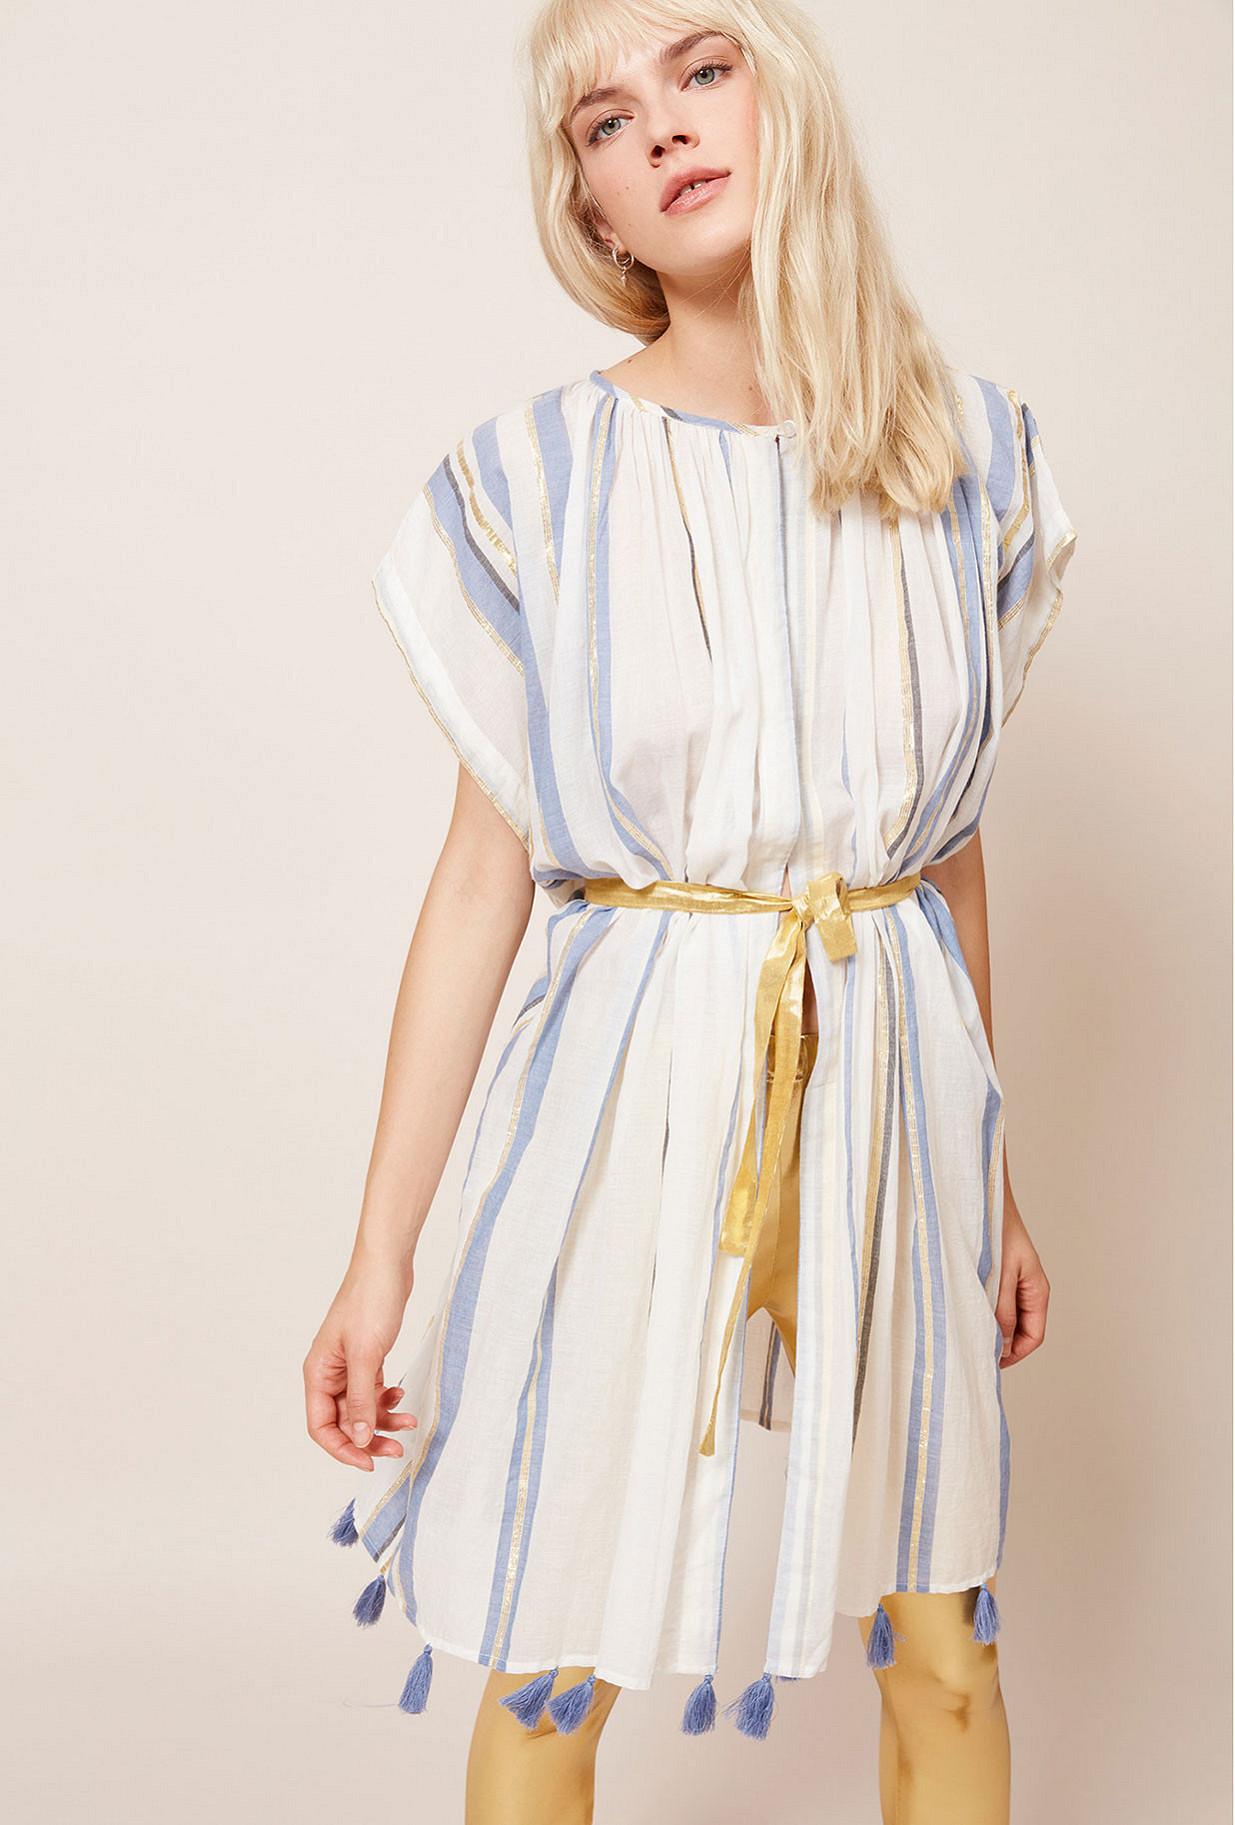 Paris clothes store Kimono  Azimut french designer fashion Paris